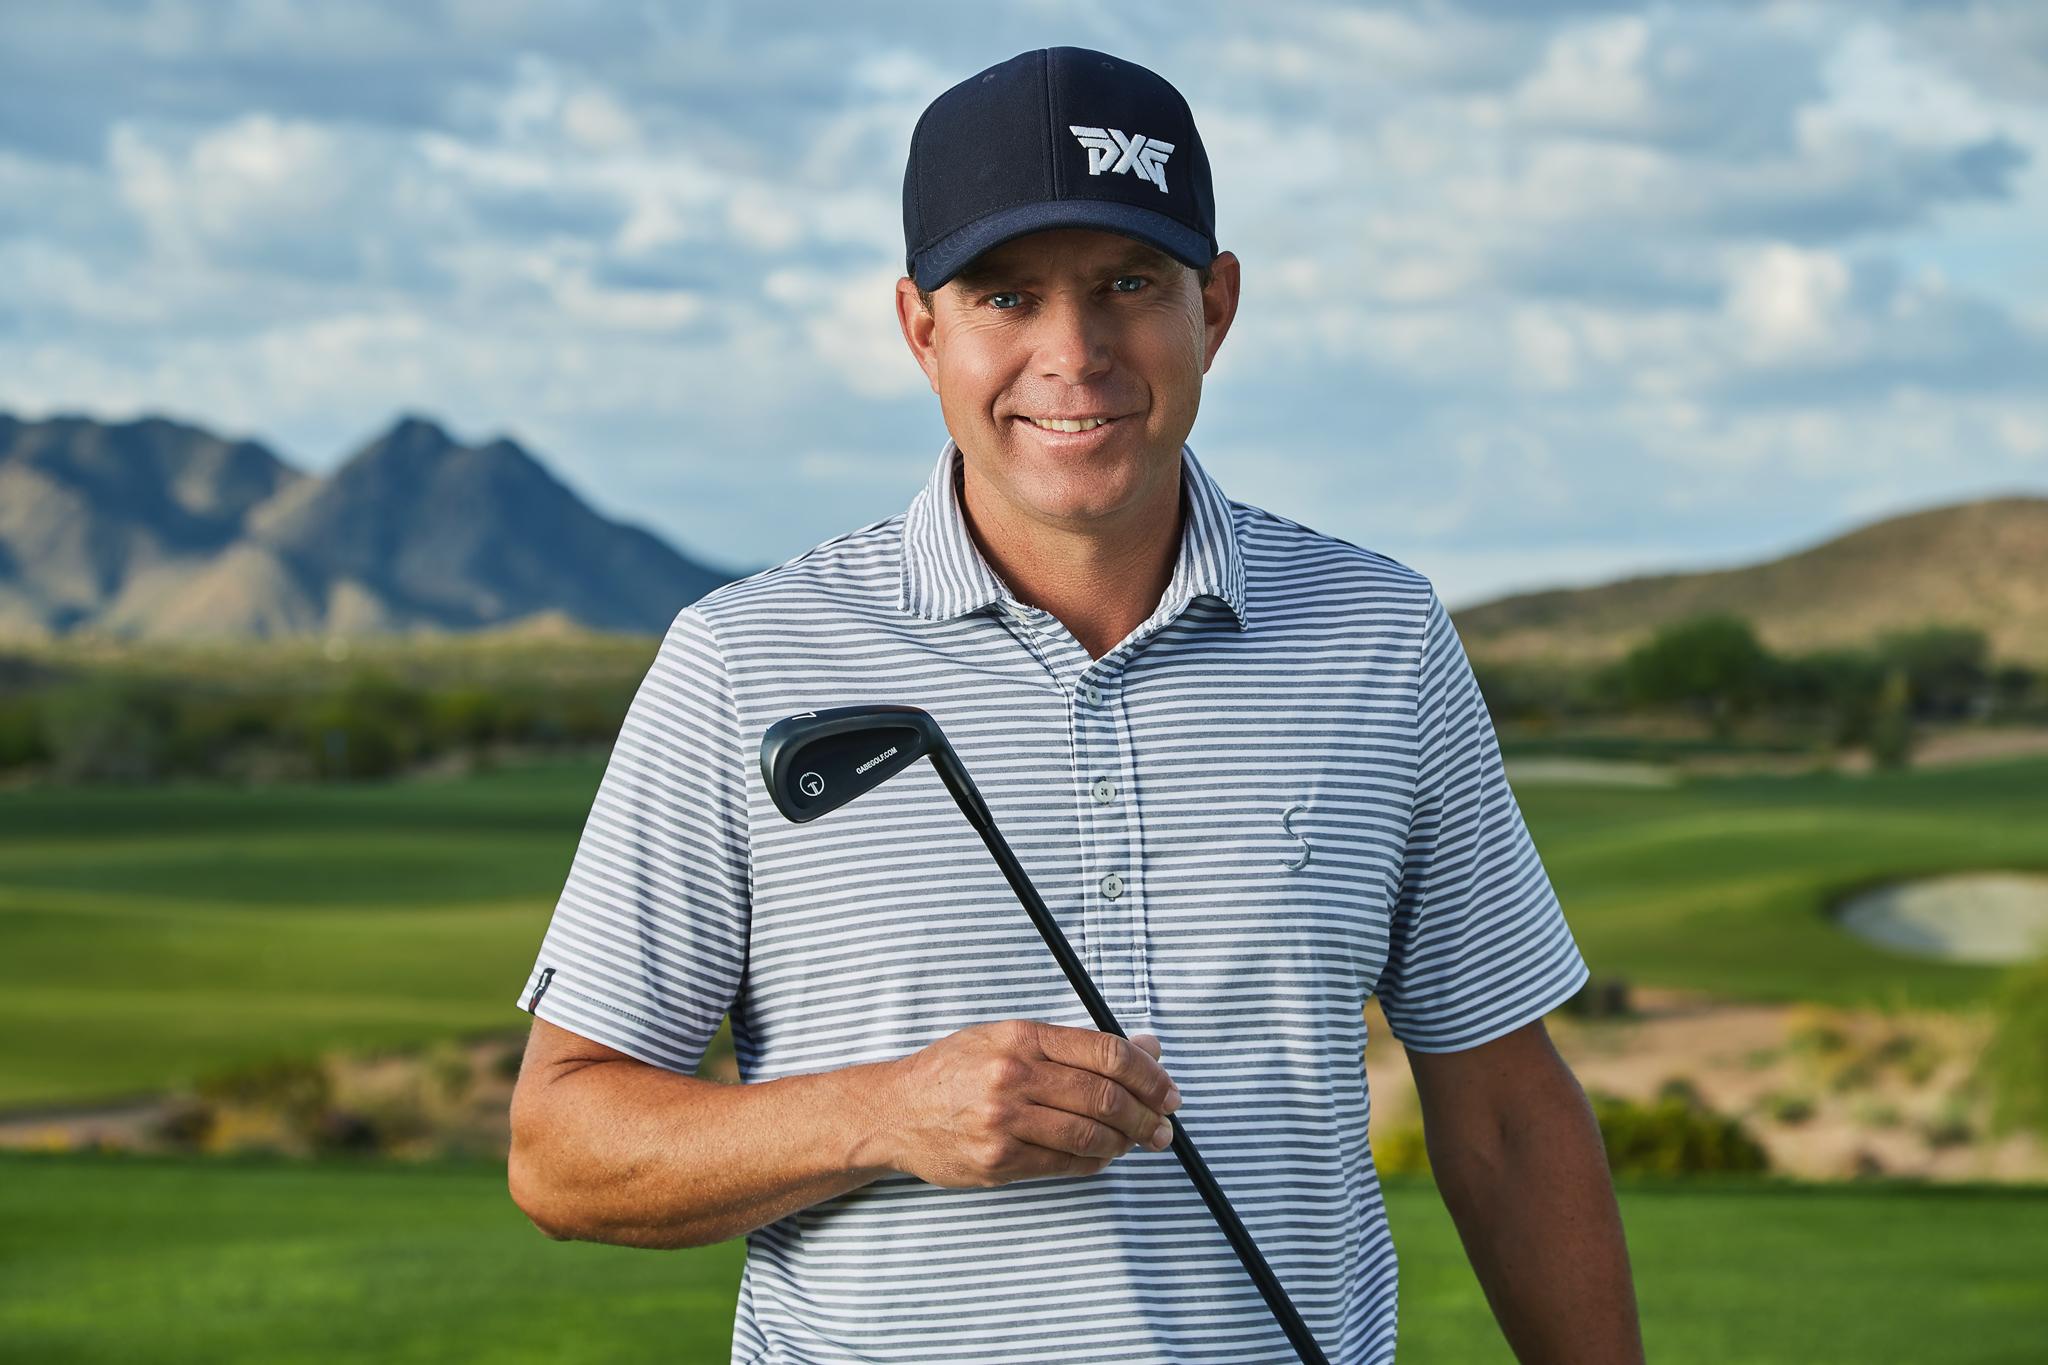 Phoenix Sports Commercial Photographer